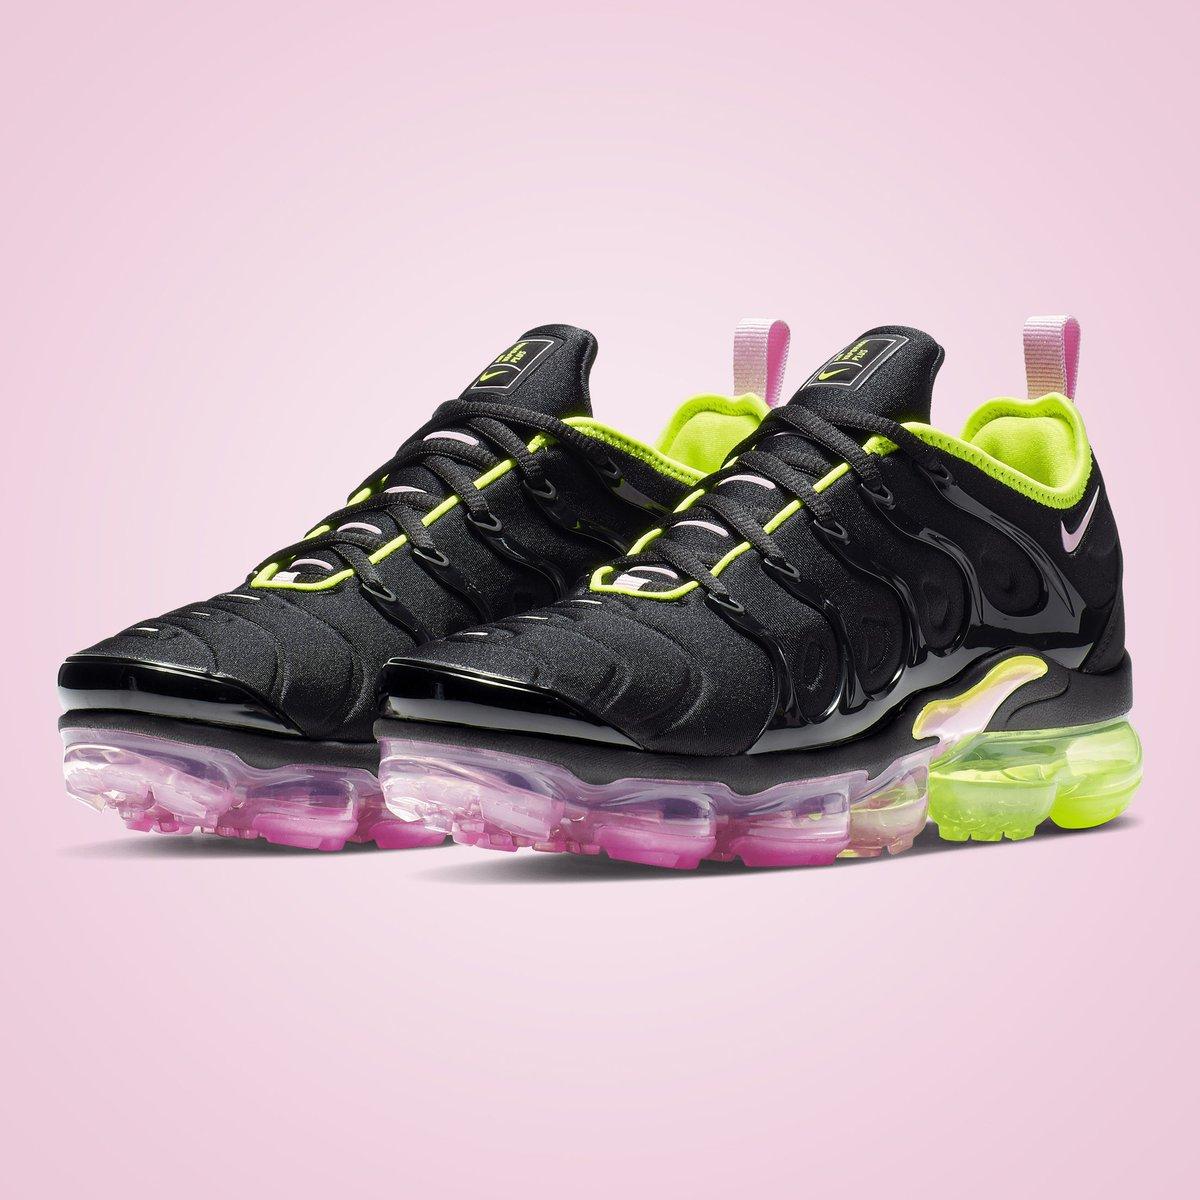 382700cc4b5c7a GB S Sneaker Shop on Twitter